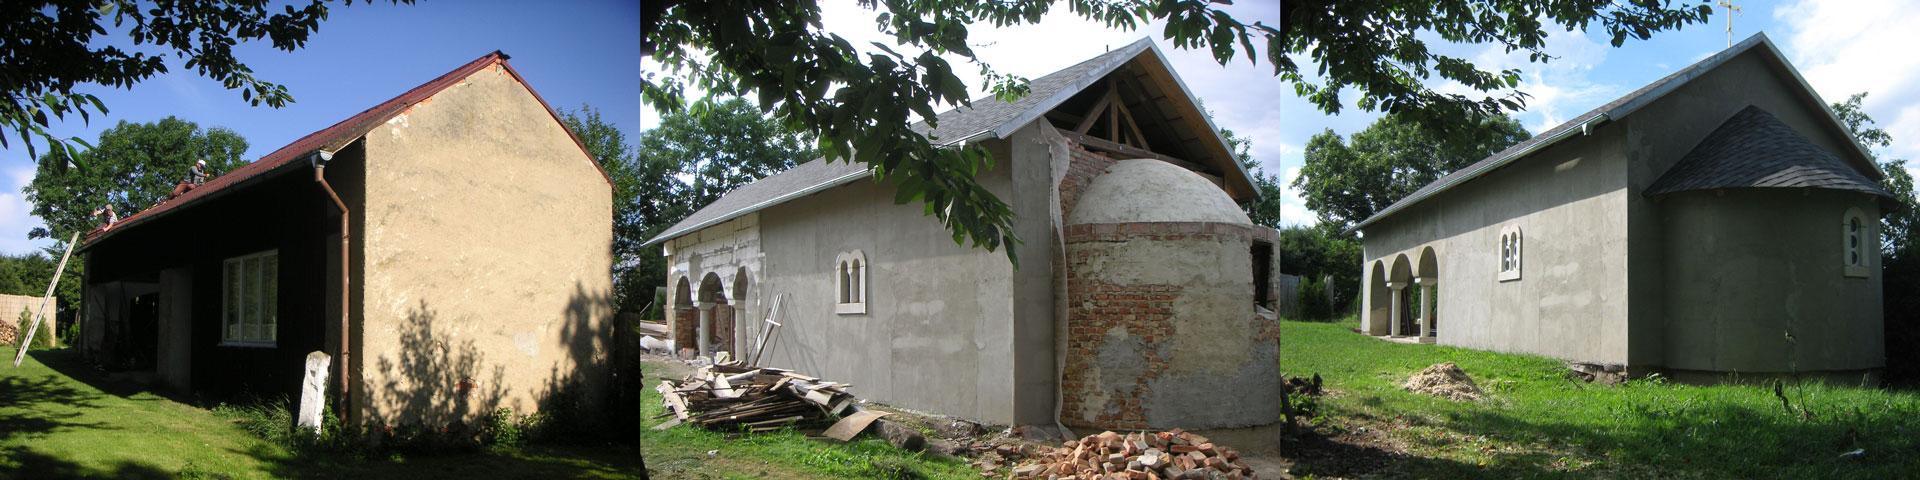 kaple-vychod